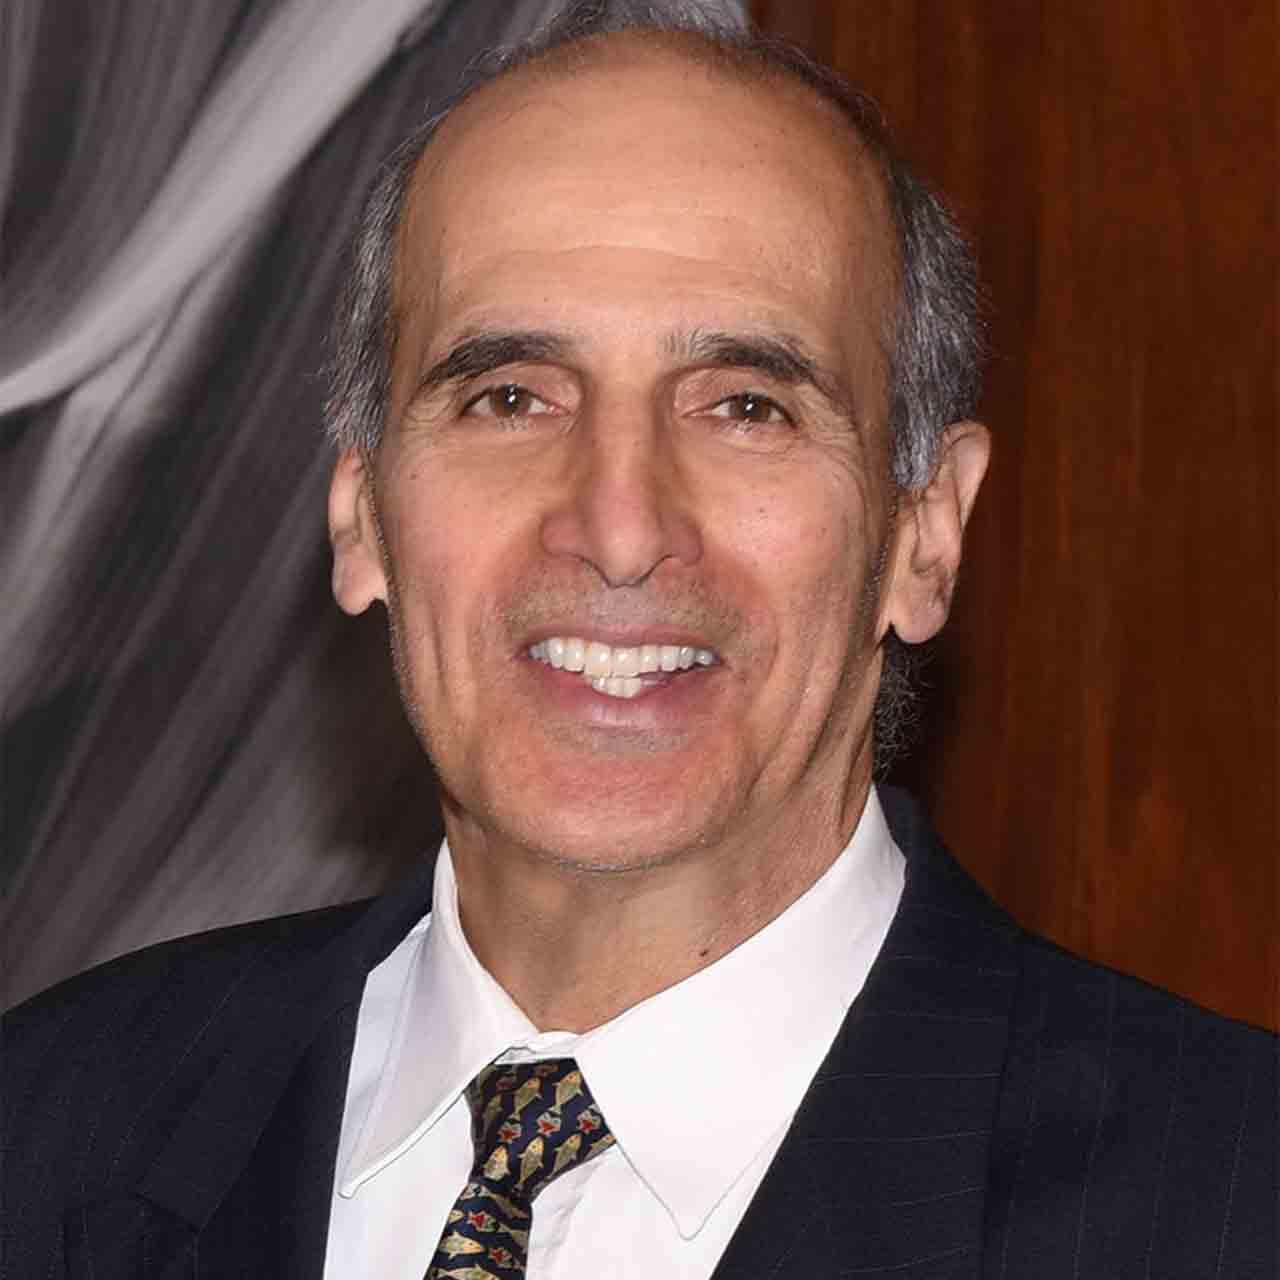 Dominic Mancini